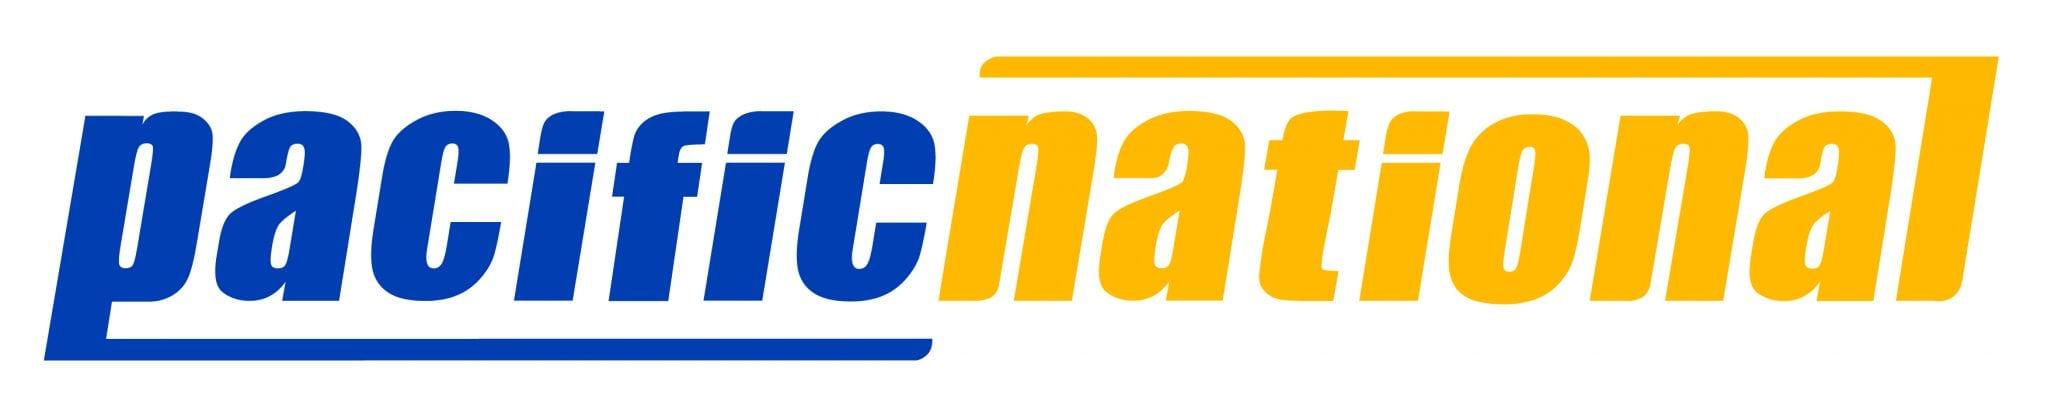 PacNat_logo